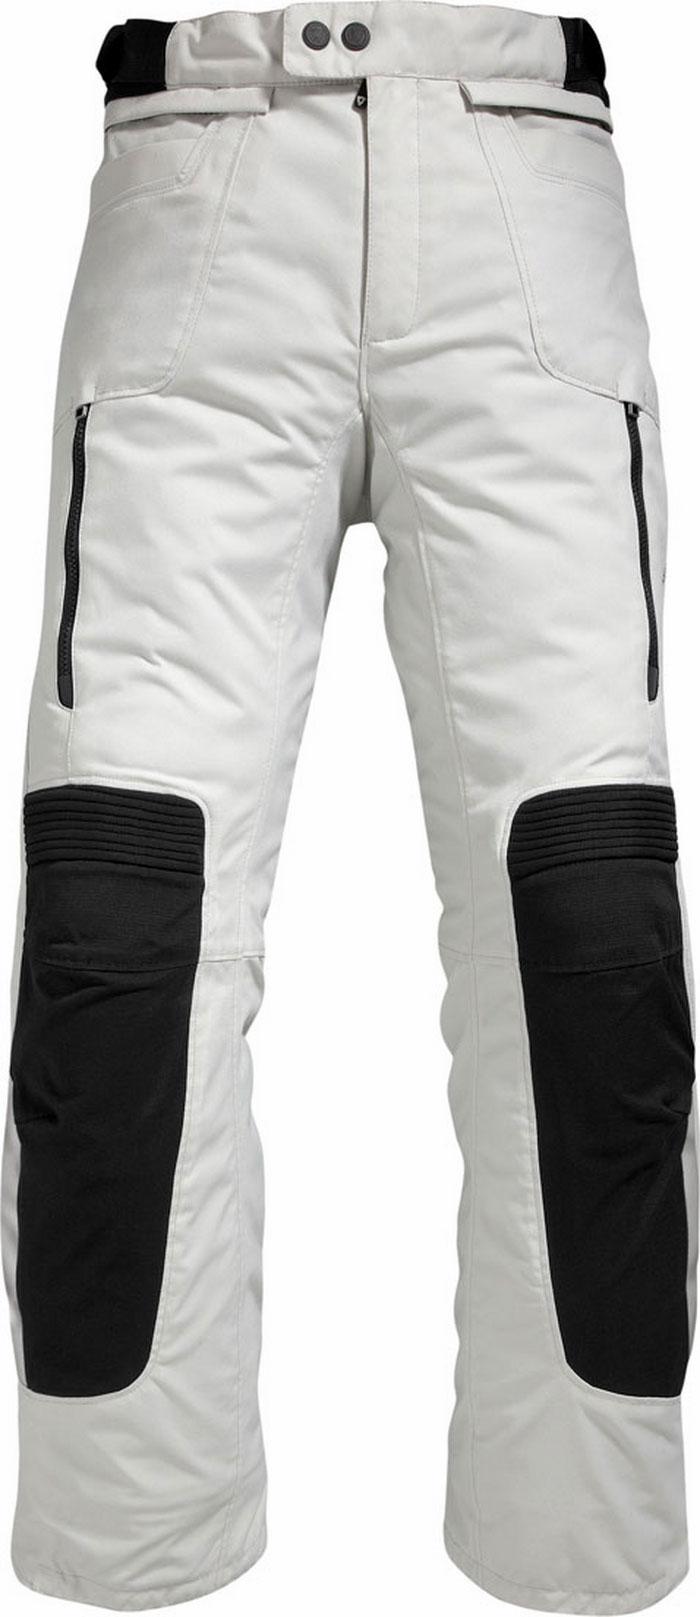 Pantaloni  moto donna Rev'it Ventura argento